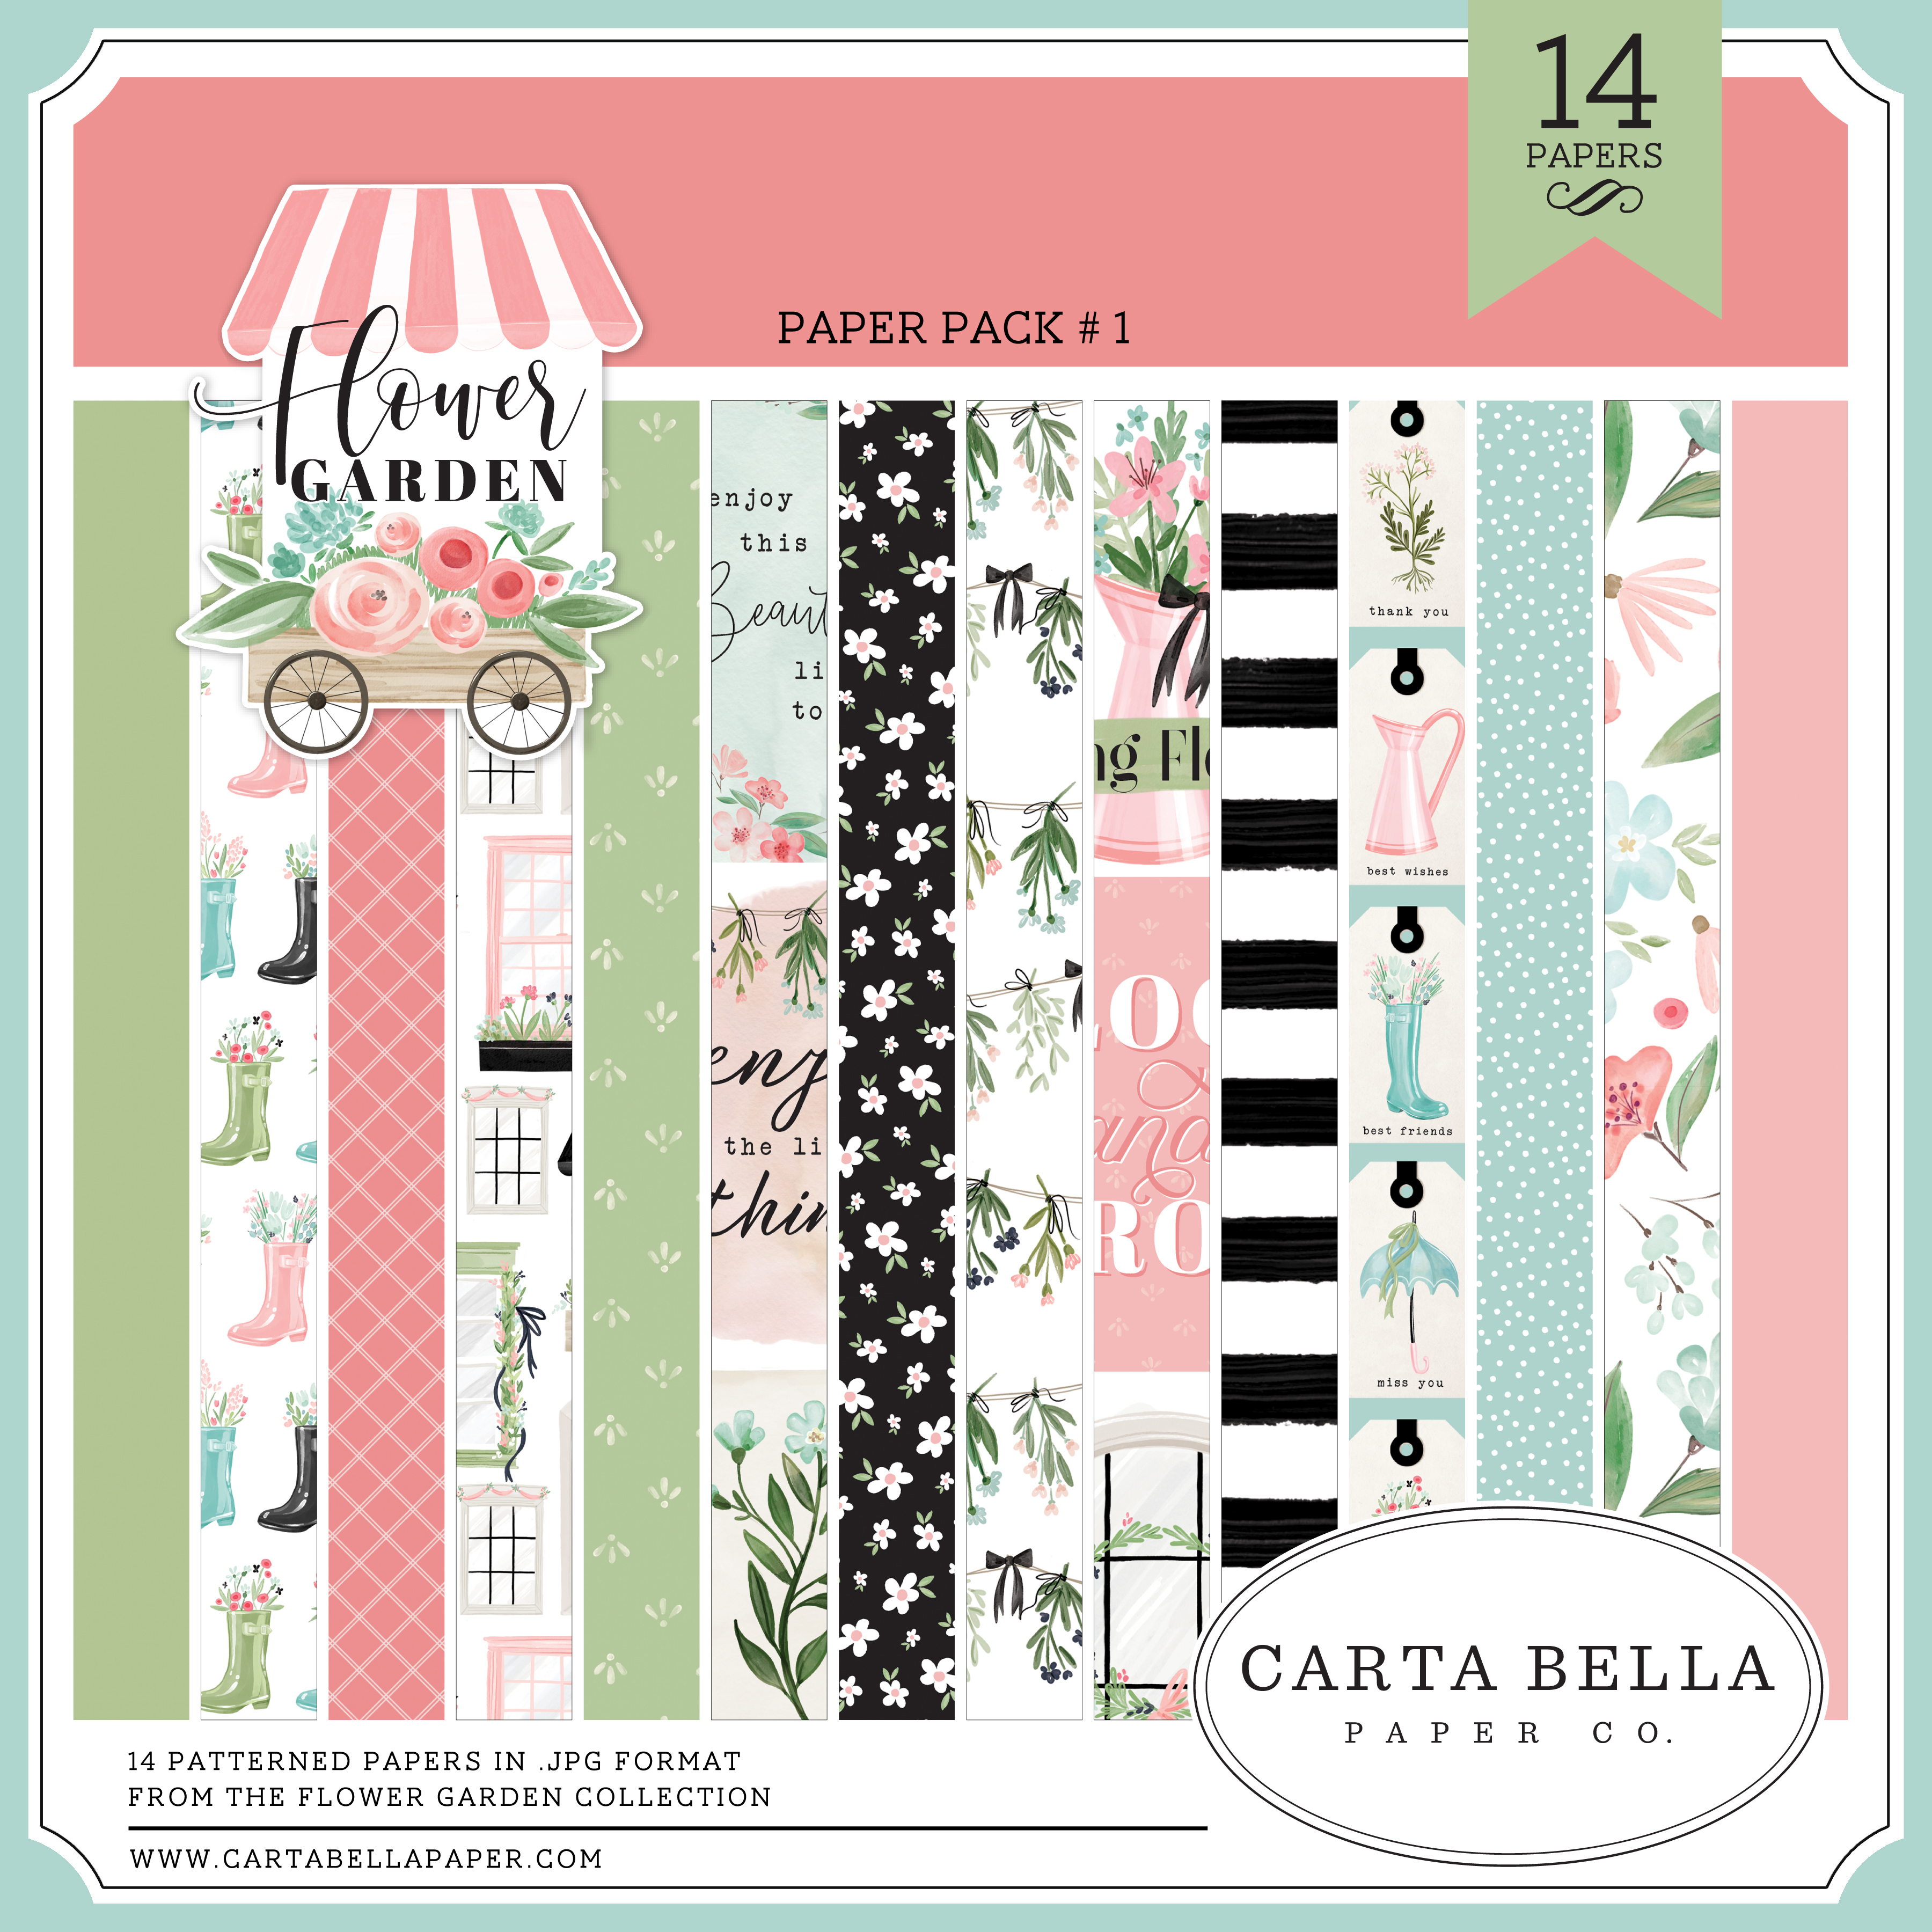 Flower Garden Paper Pack #1